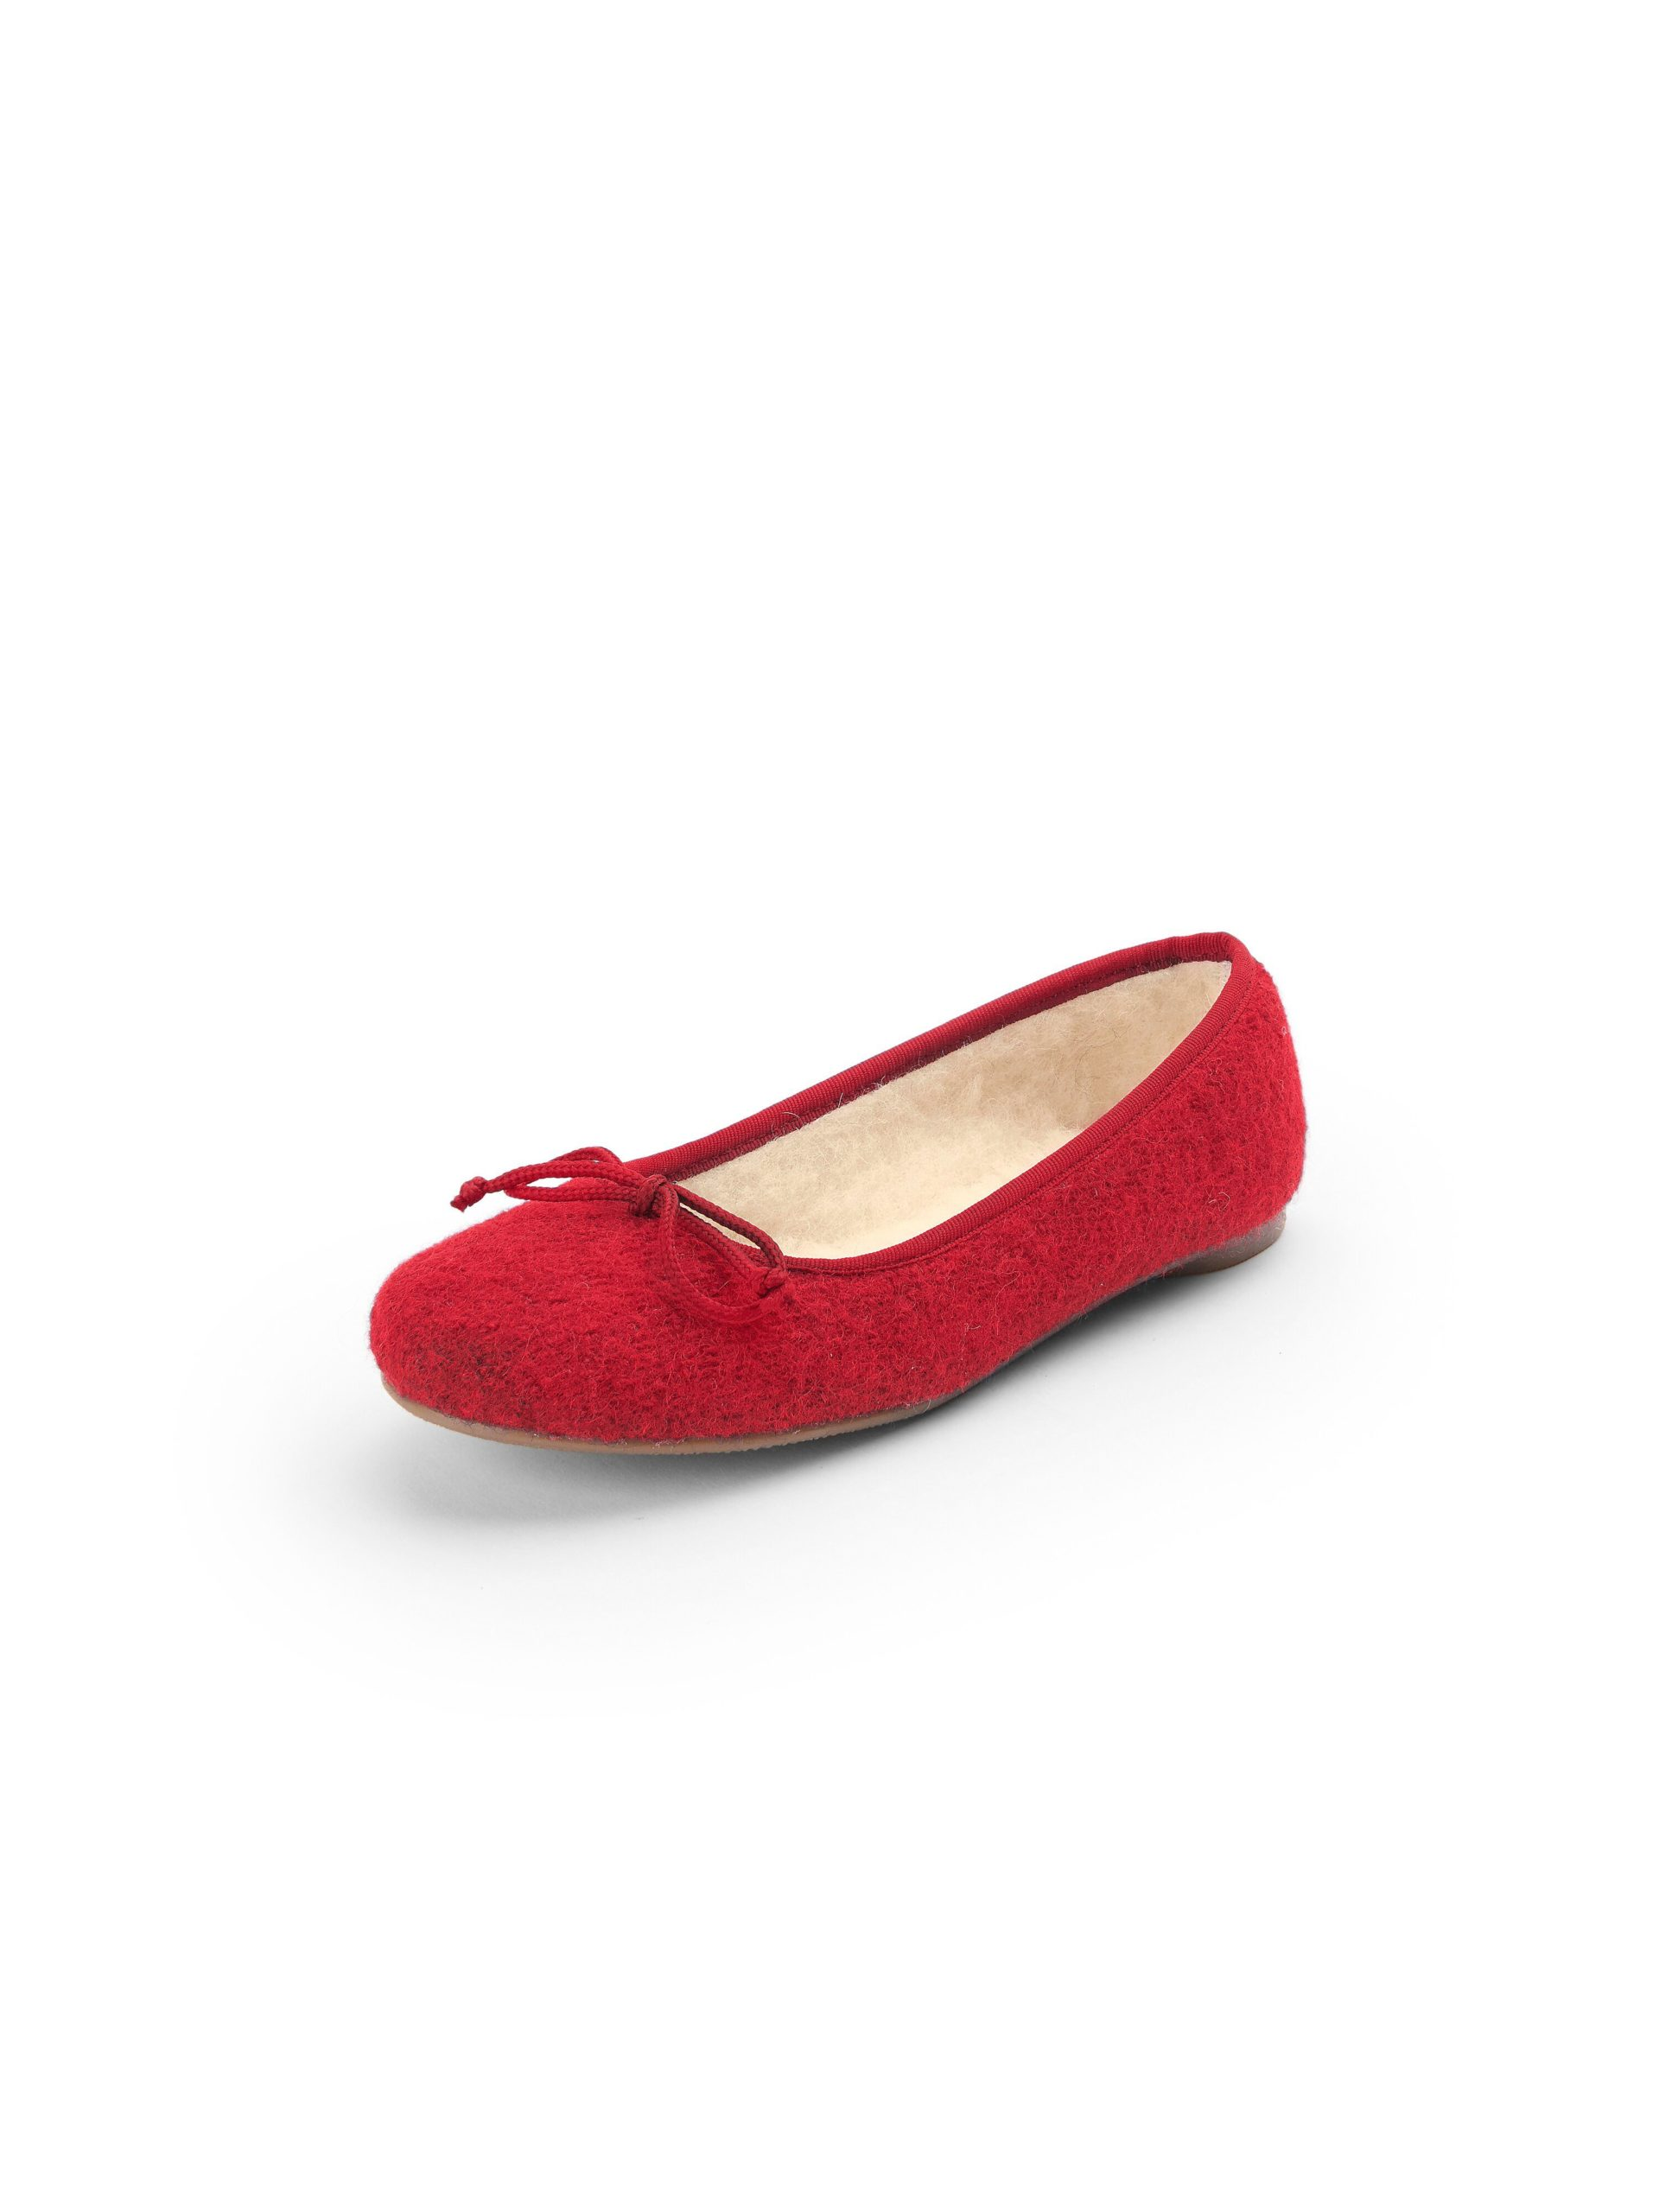 Ballerina's Van Kitzpichler rood Kopen